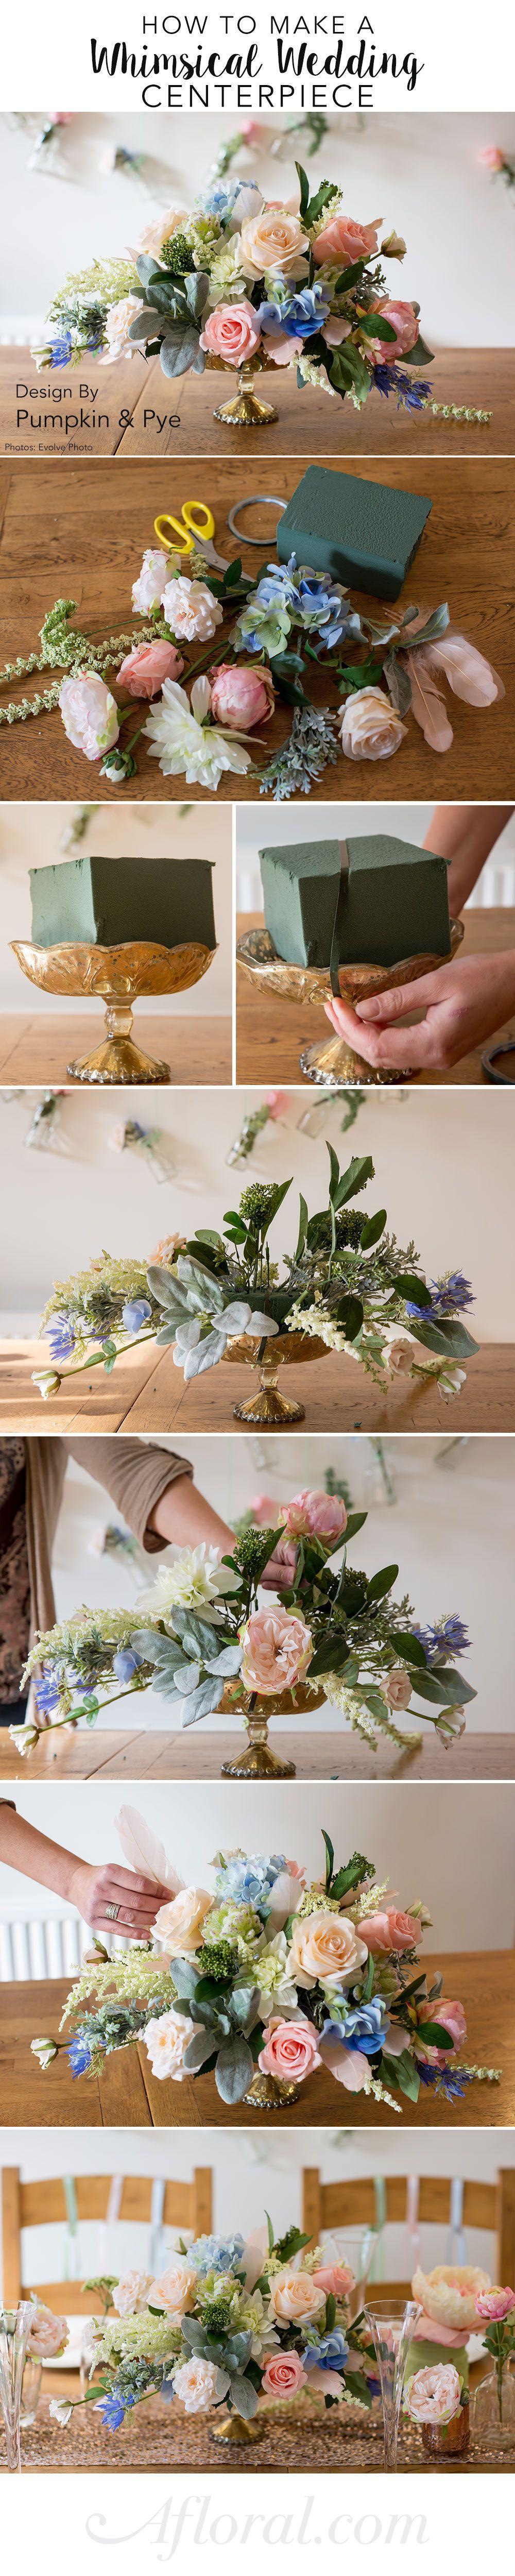 wedding centerpieces fake flowers%0A HowTo DIY Whimsical Wedding Centerpiece  Diy Wedding Flower CenterpiecesDiy  Silk